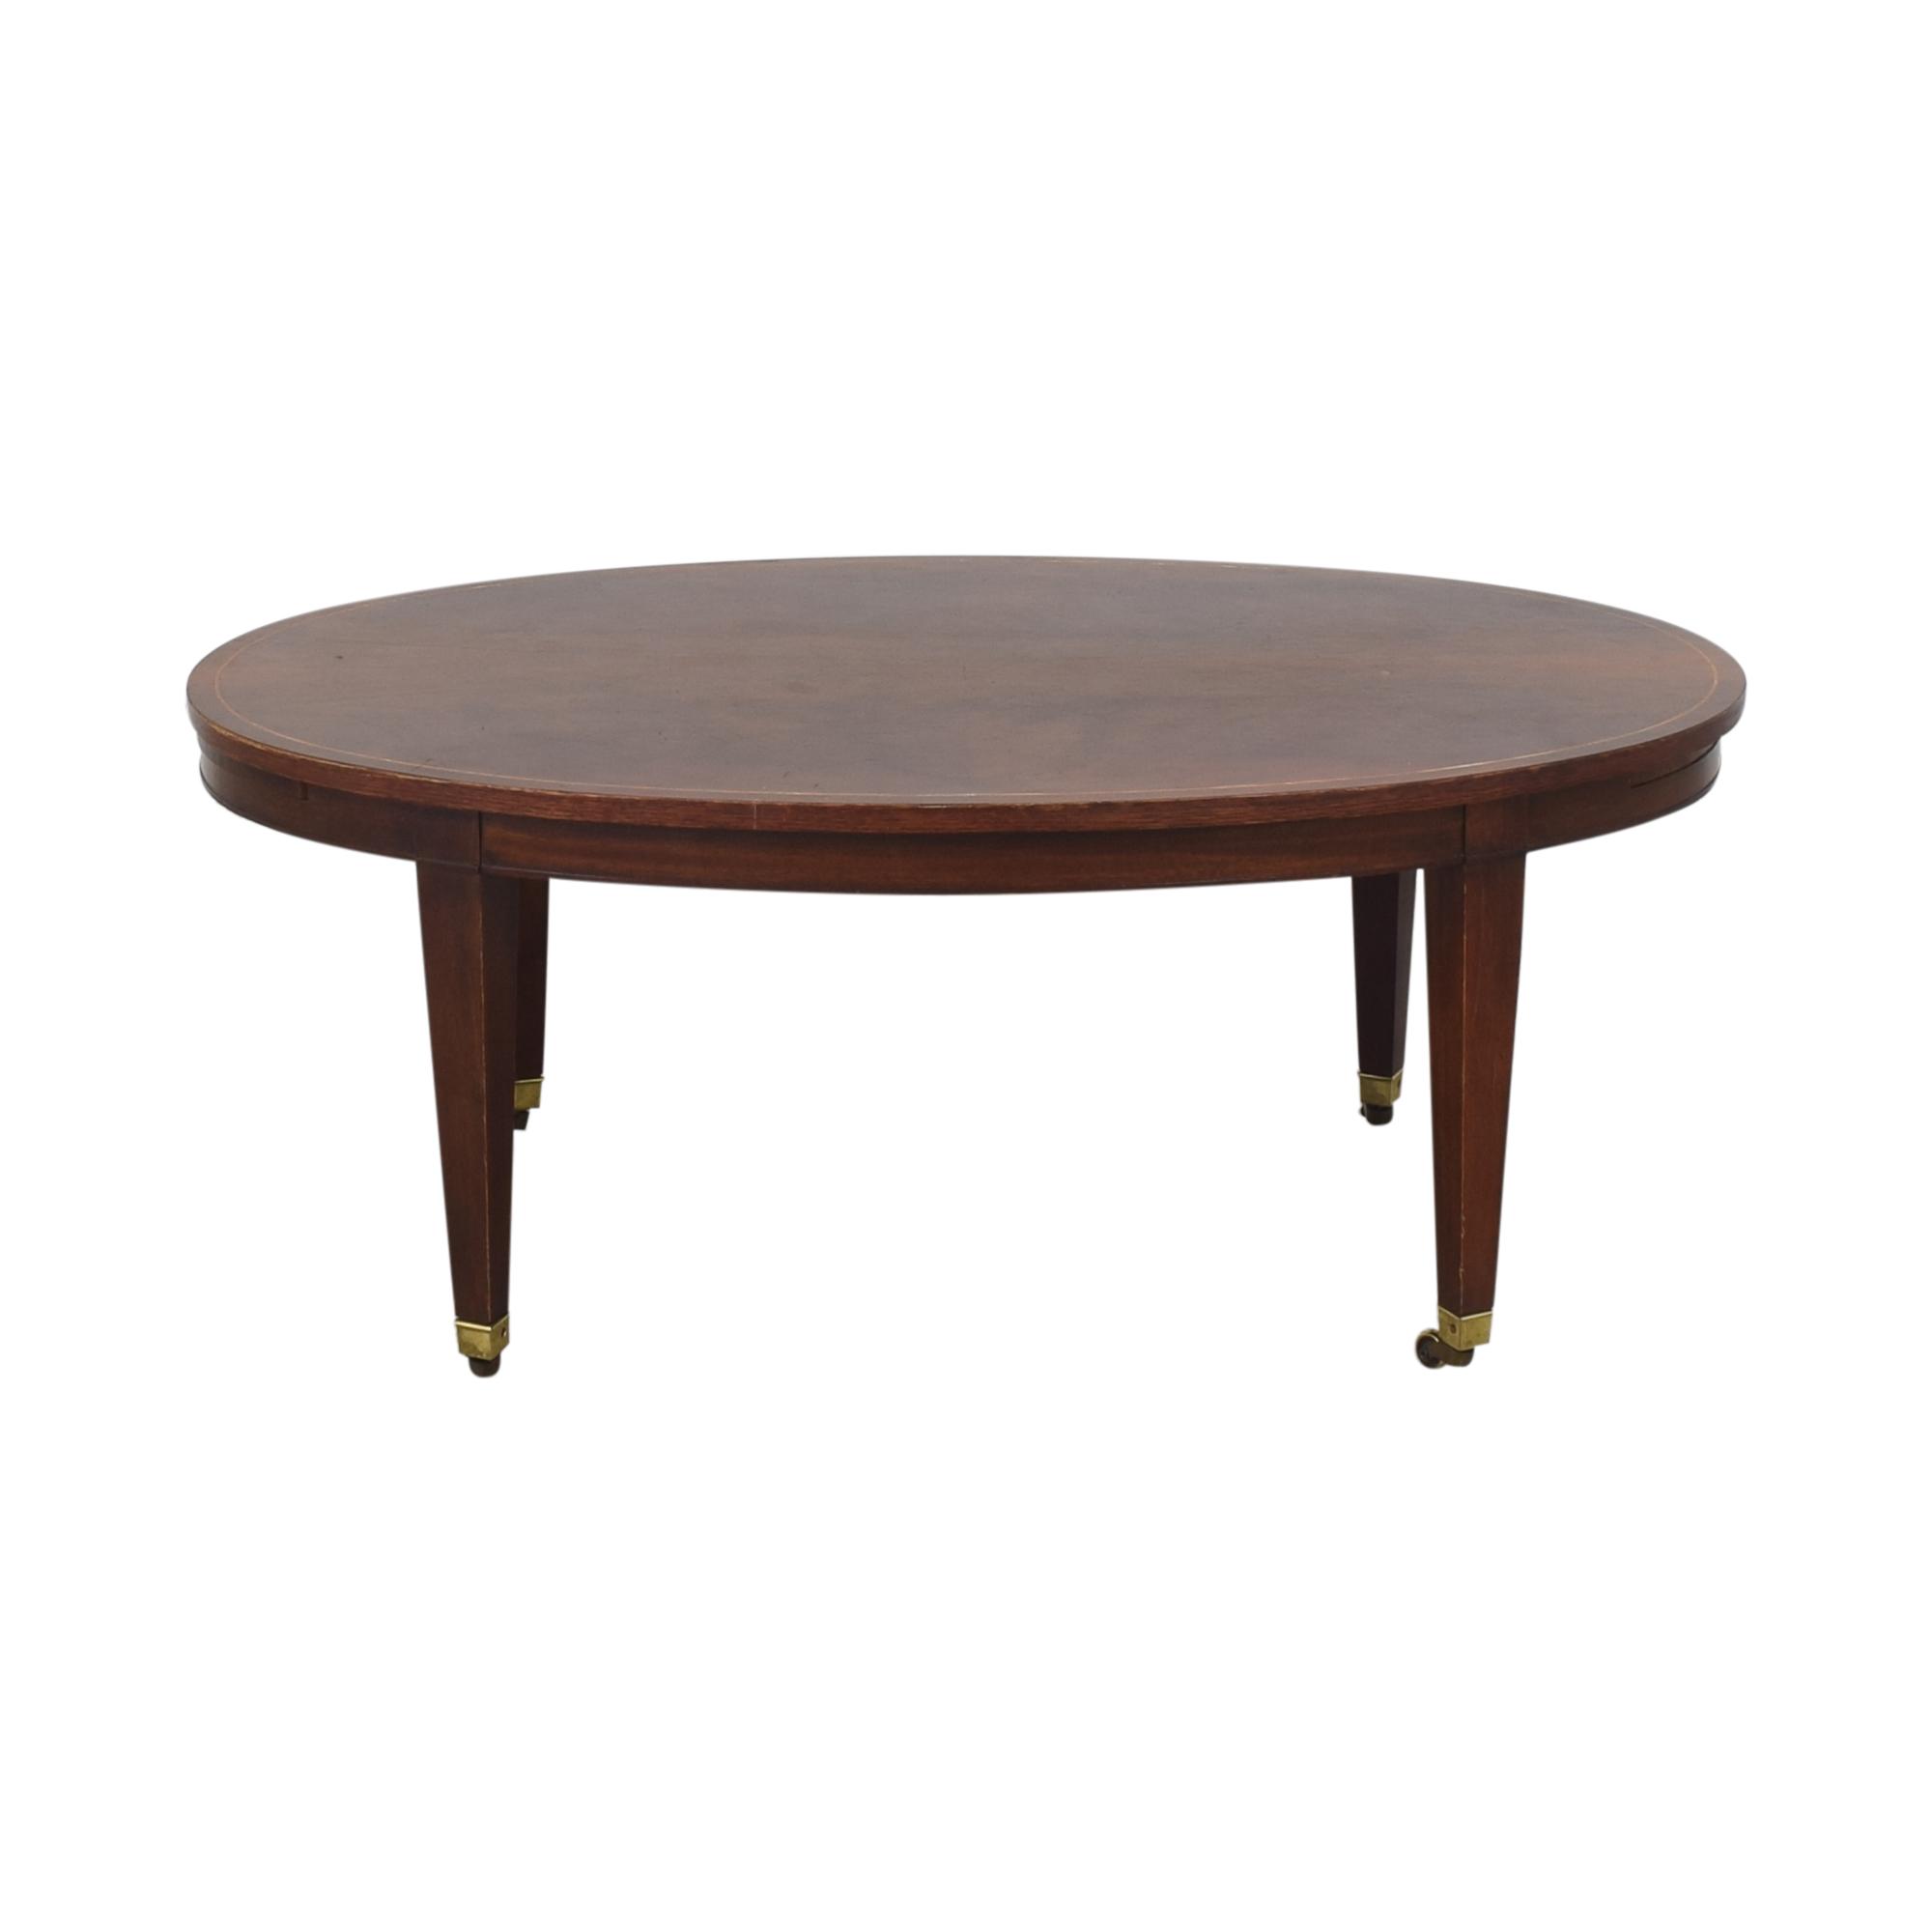 Baker Furniture Baker Furniture Hepplewhite Coffee Table second hand